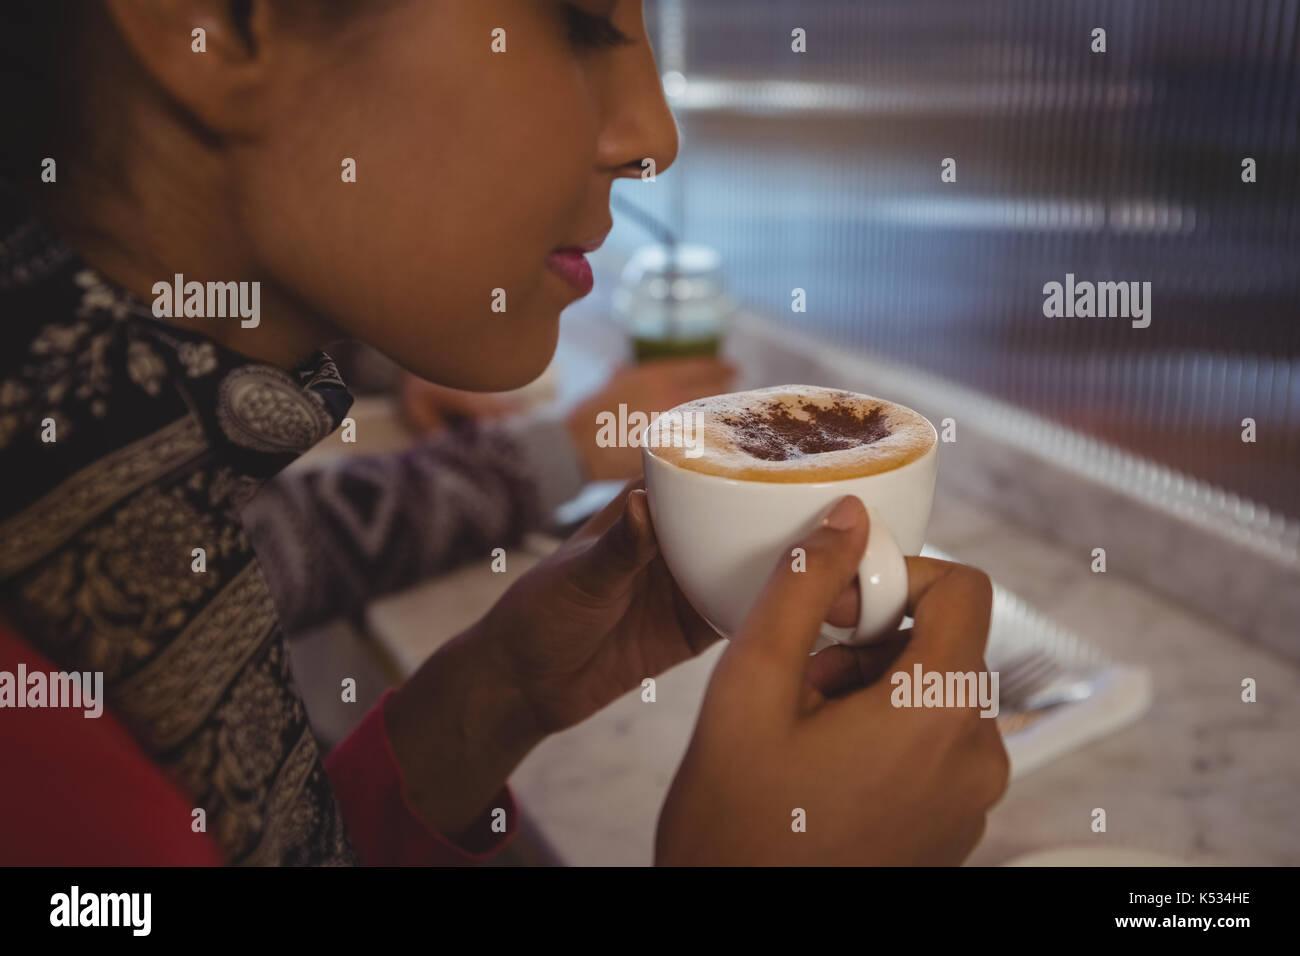 Close-up de joven con café en el café Foto de stock